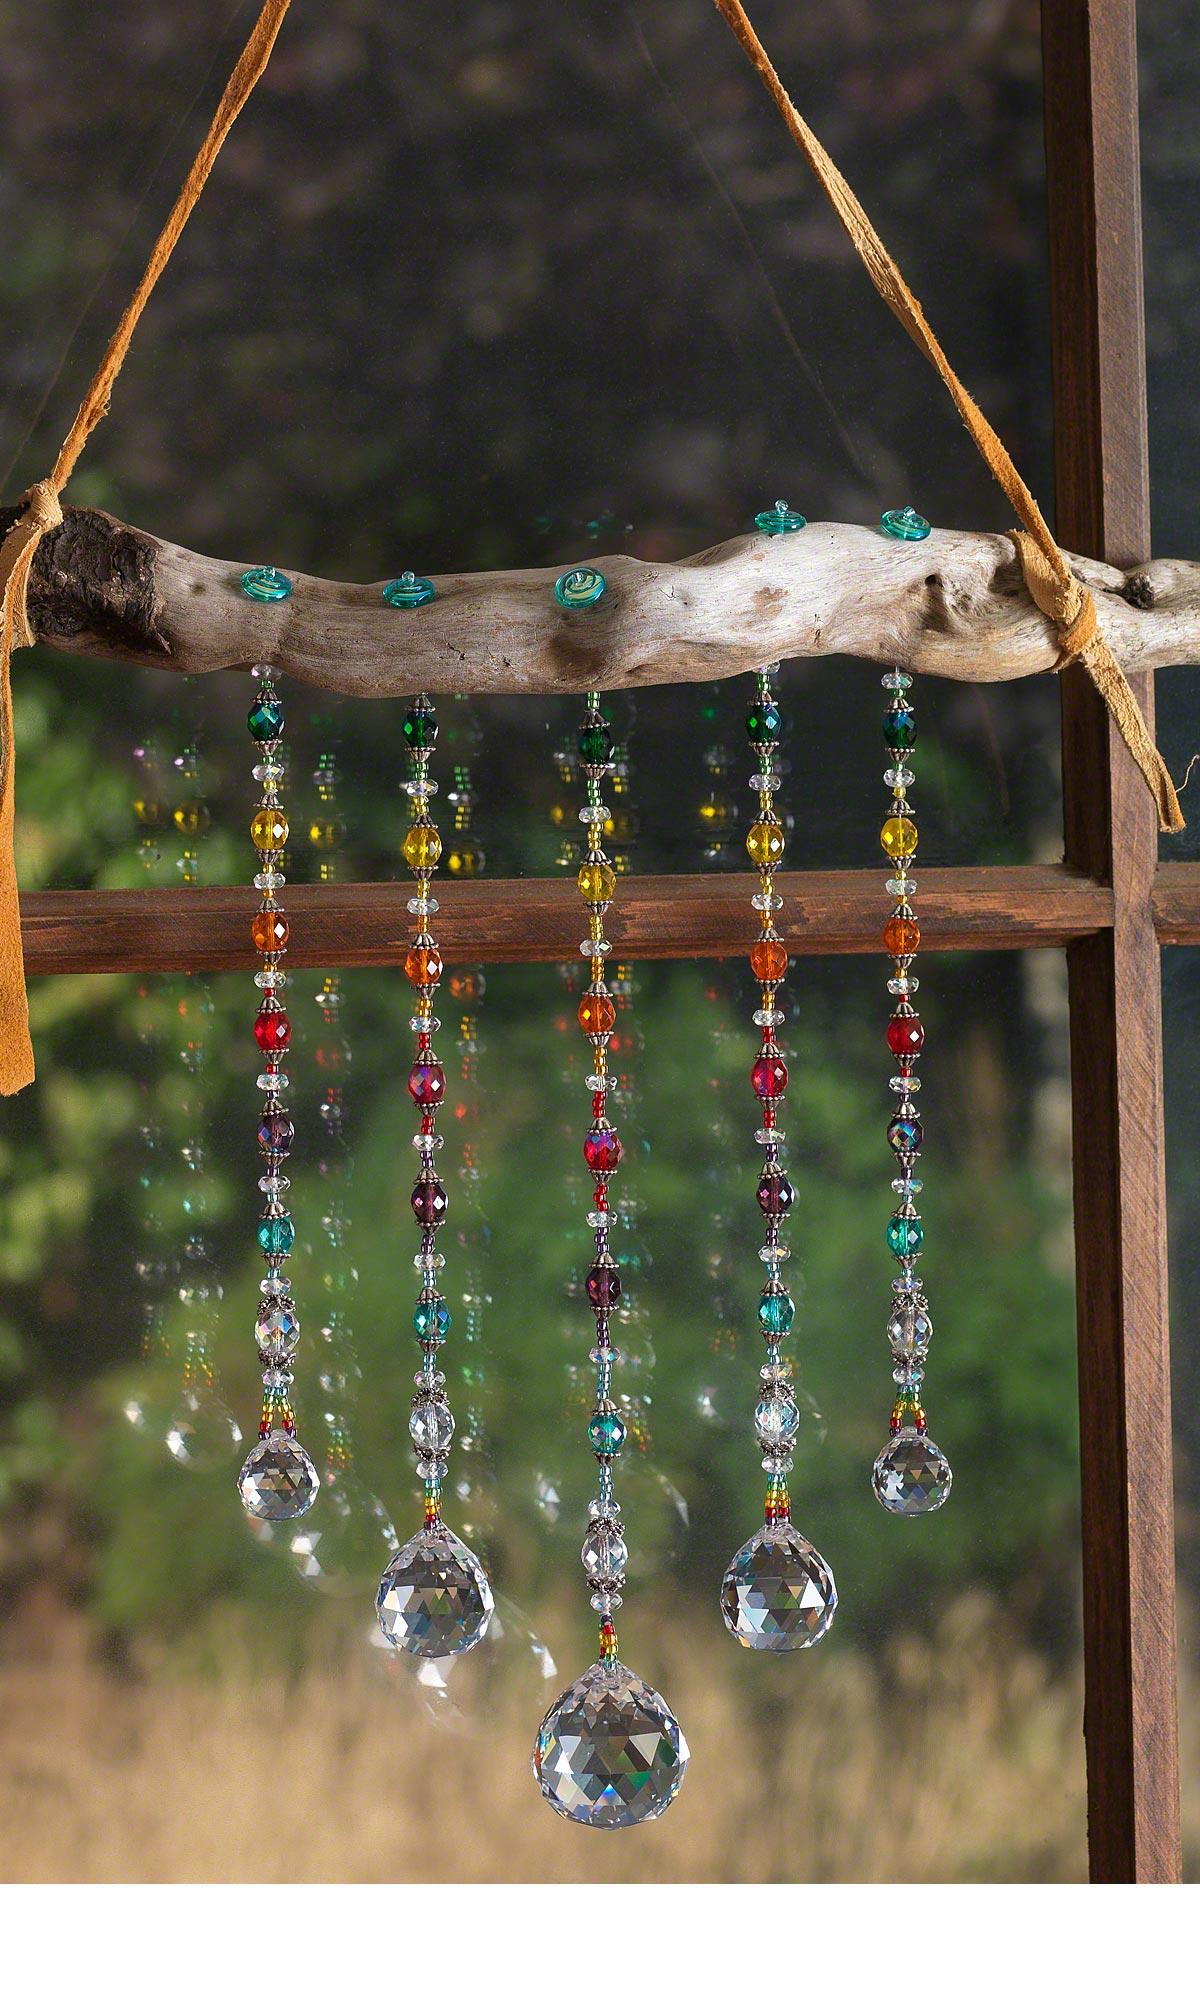 Jewelry Design Rainbow Catcher With Fire Polished Beads